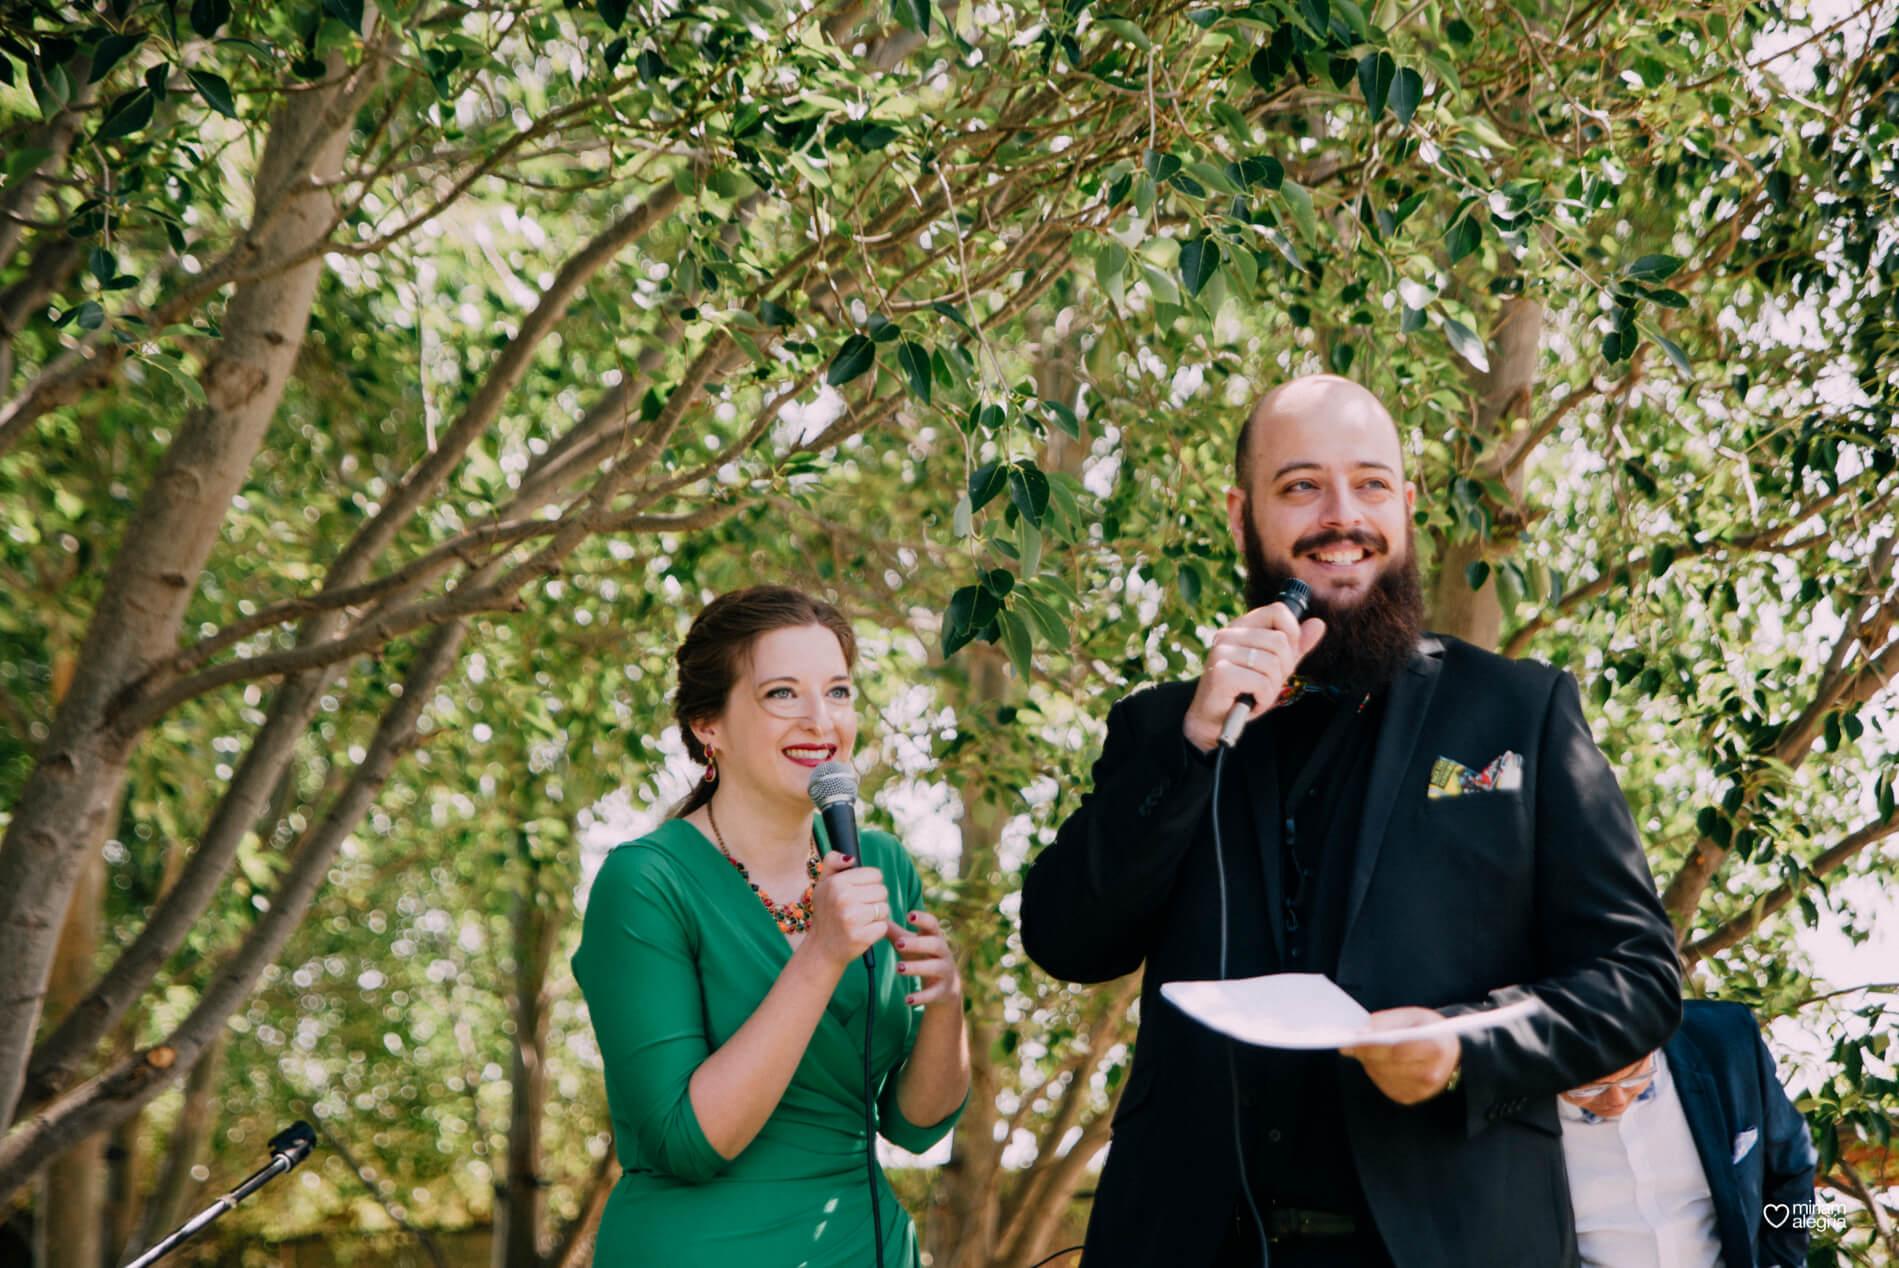 boda-en-finca-jurosa-miriam-alegria-69